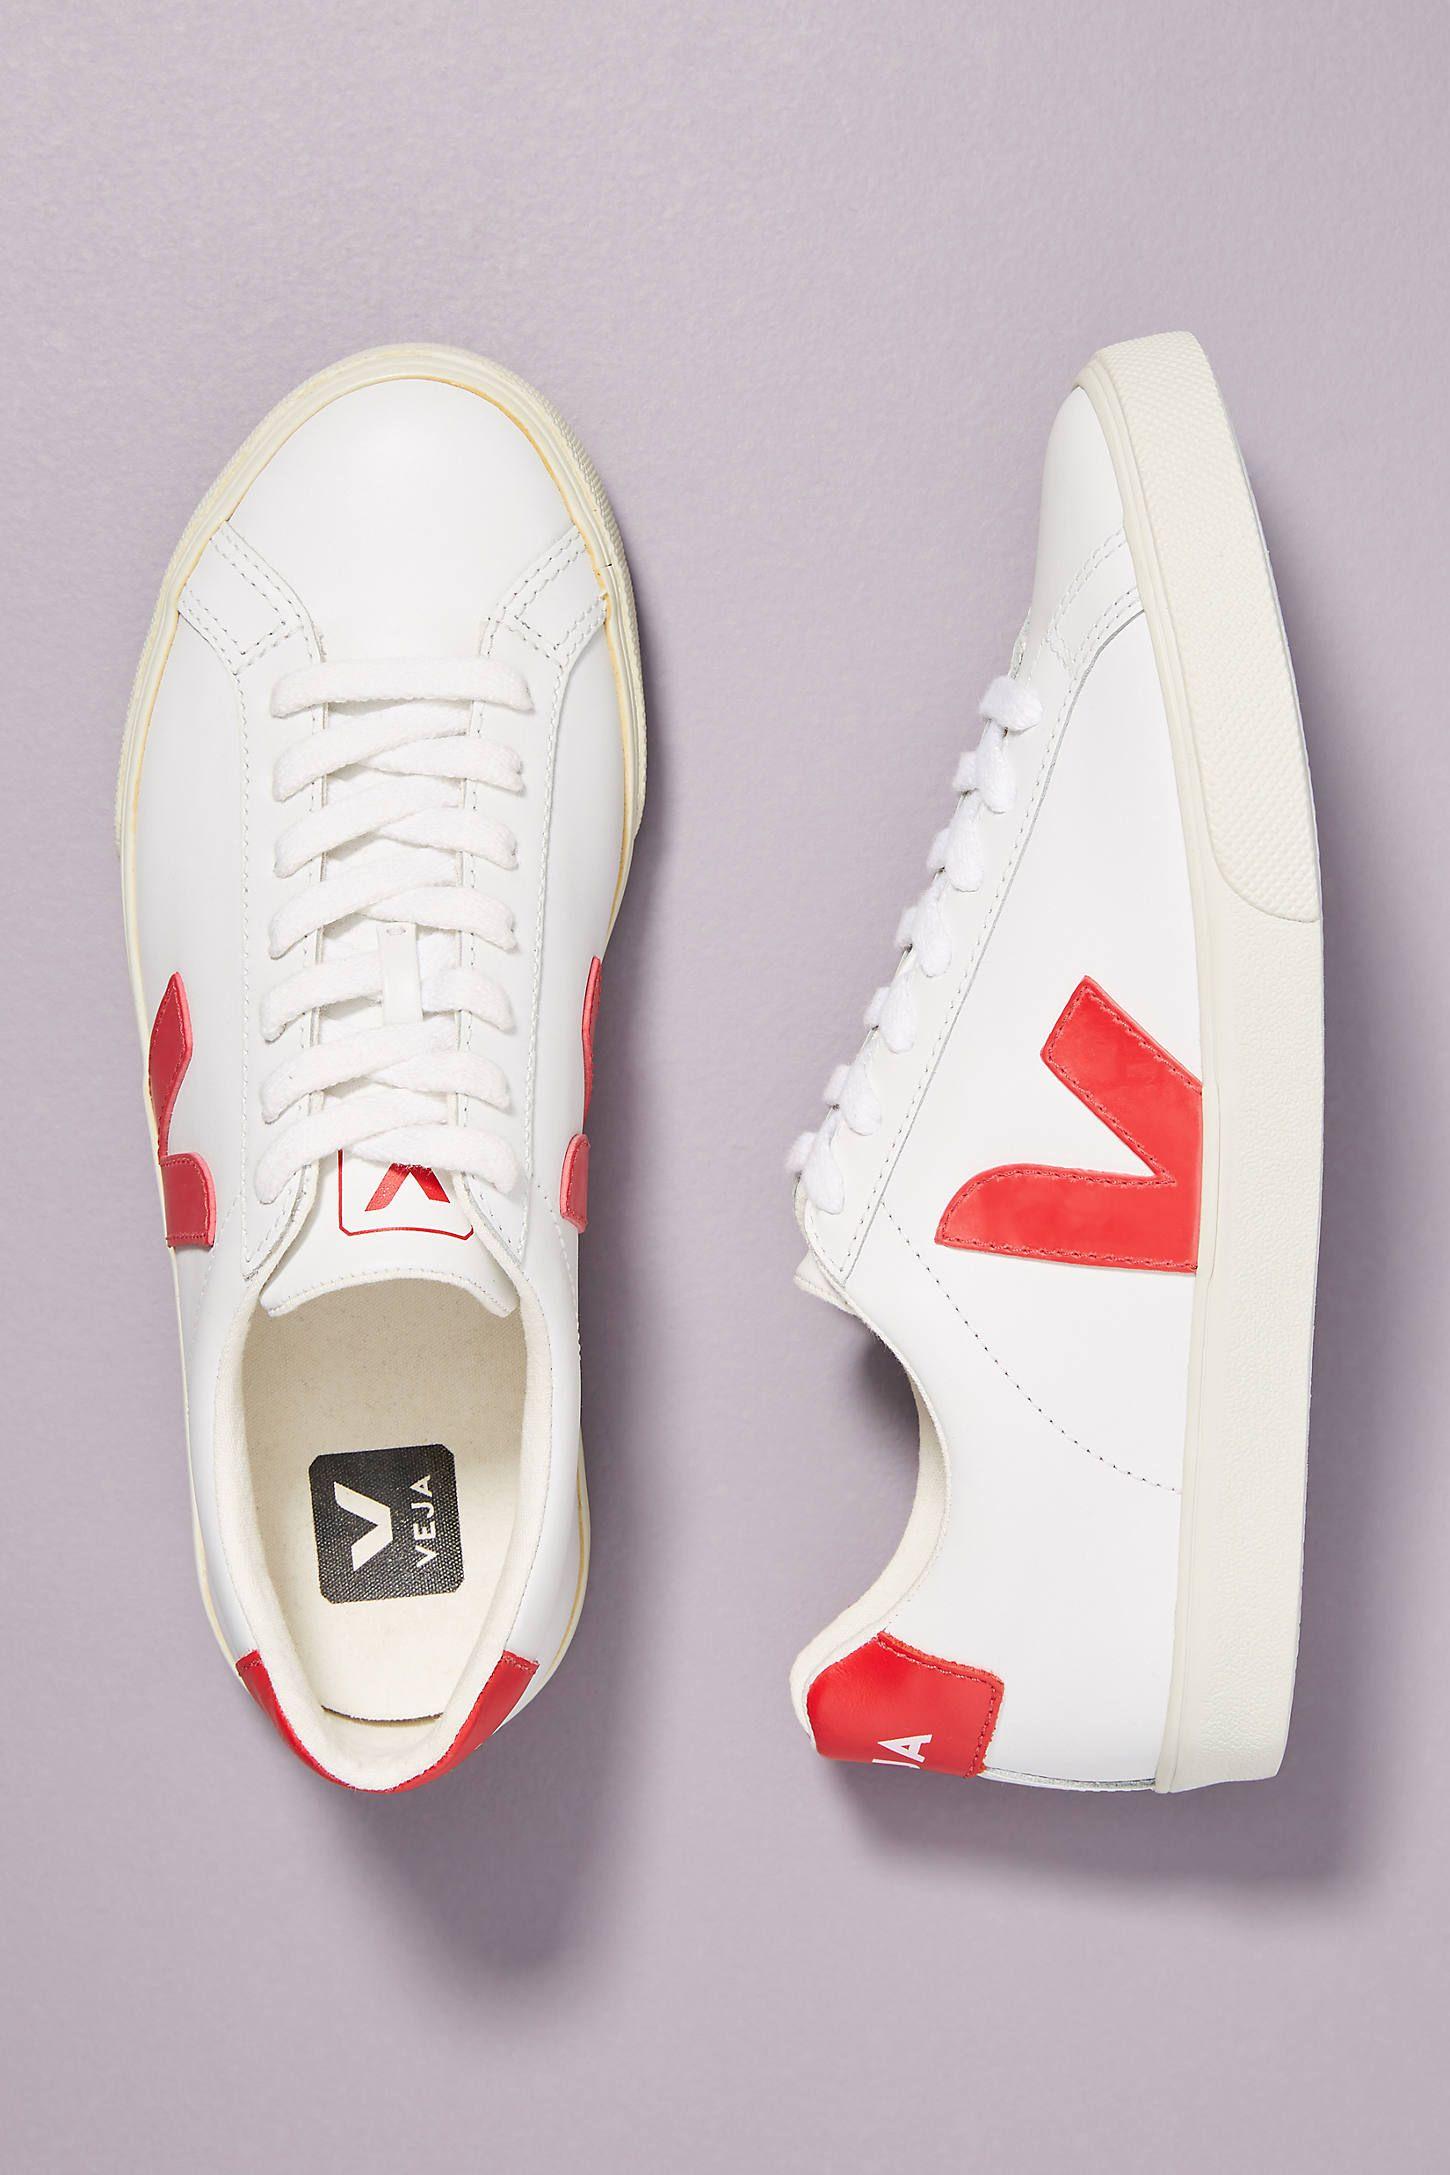 Veja Red Low-top Sneakers | ModeSens in